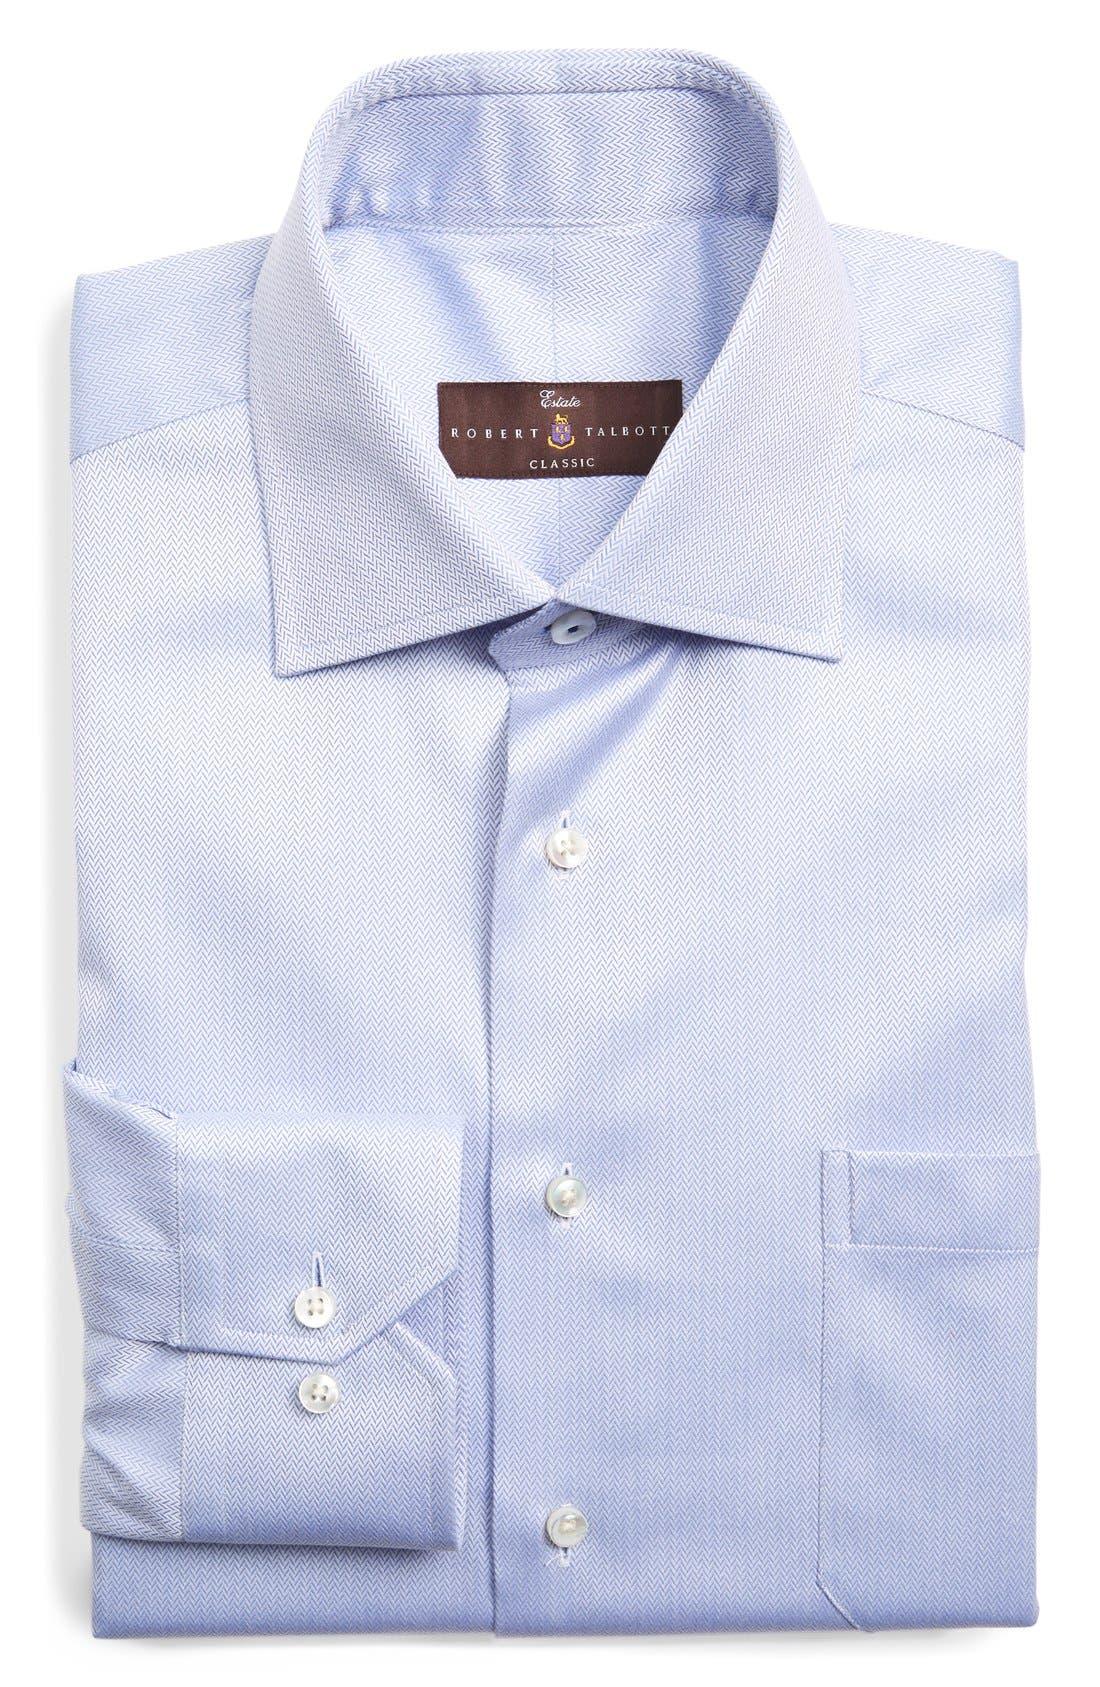 Classic Fit Dress Shirt,                             Main thumbnail 1, color,                             450